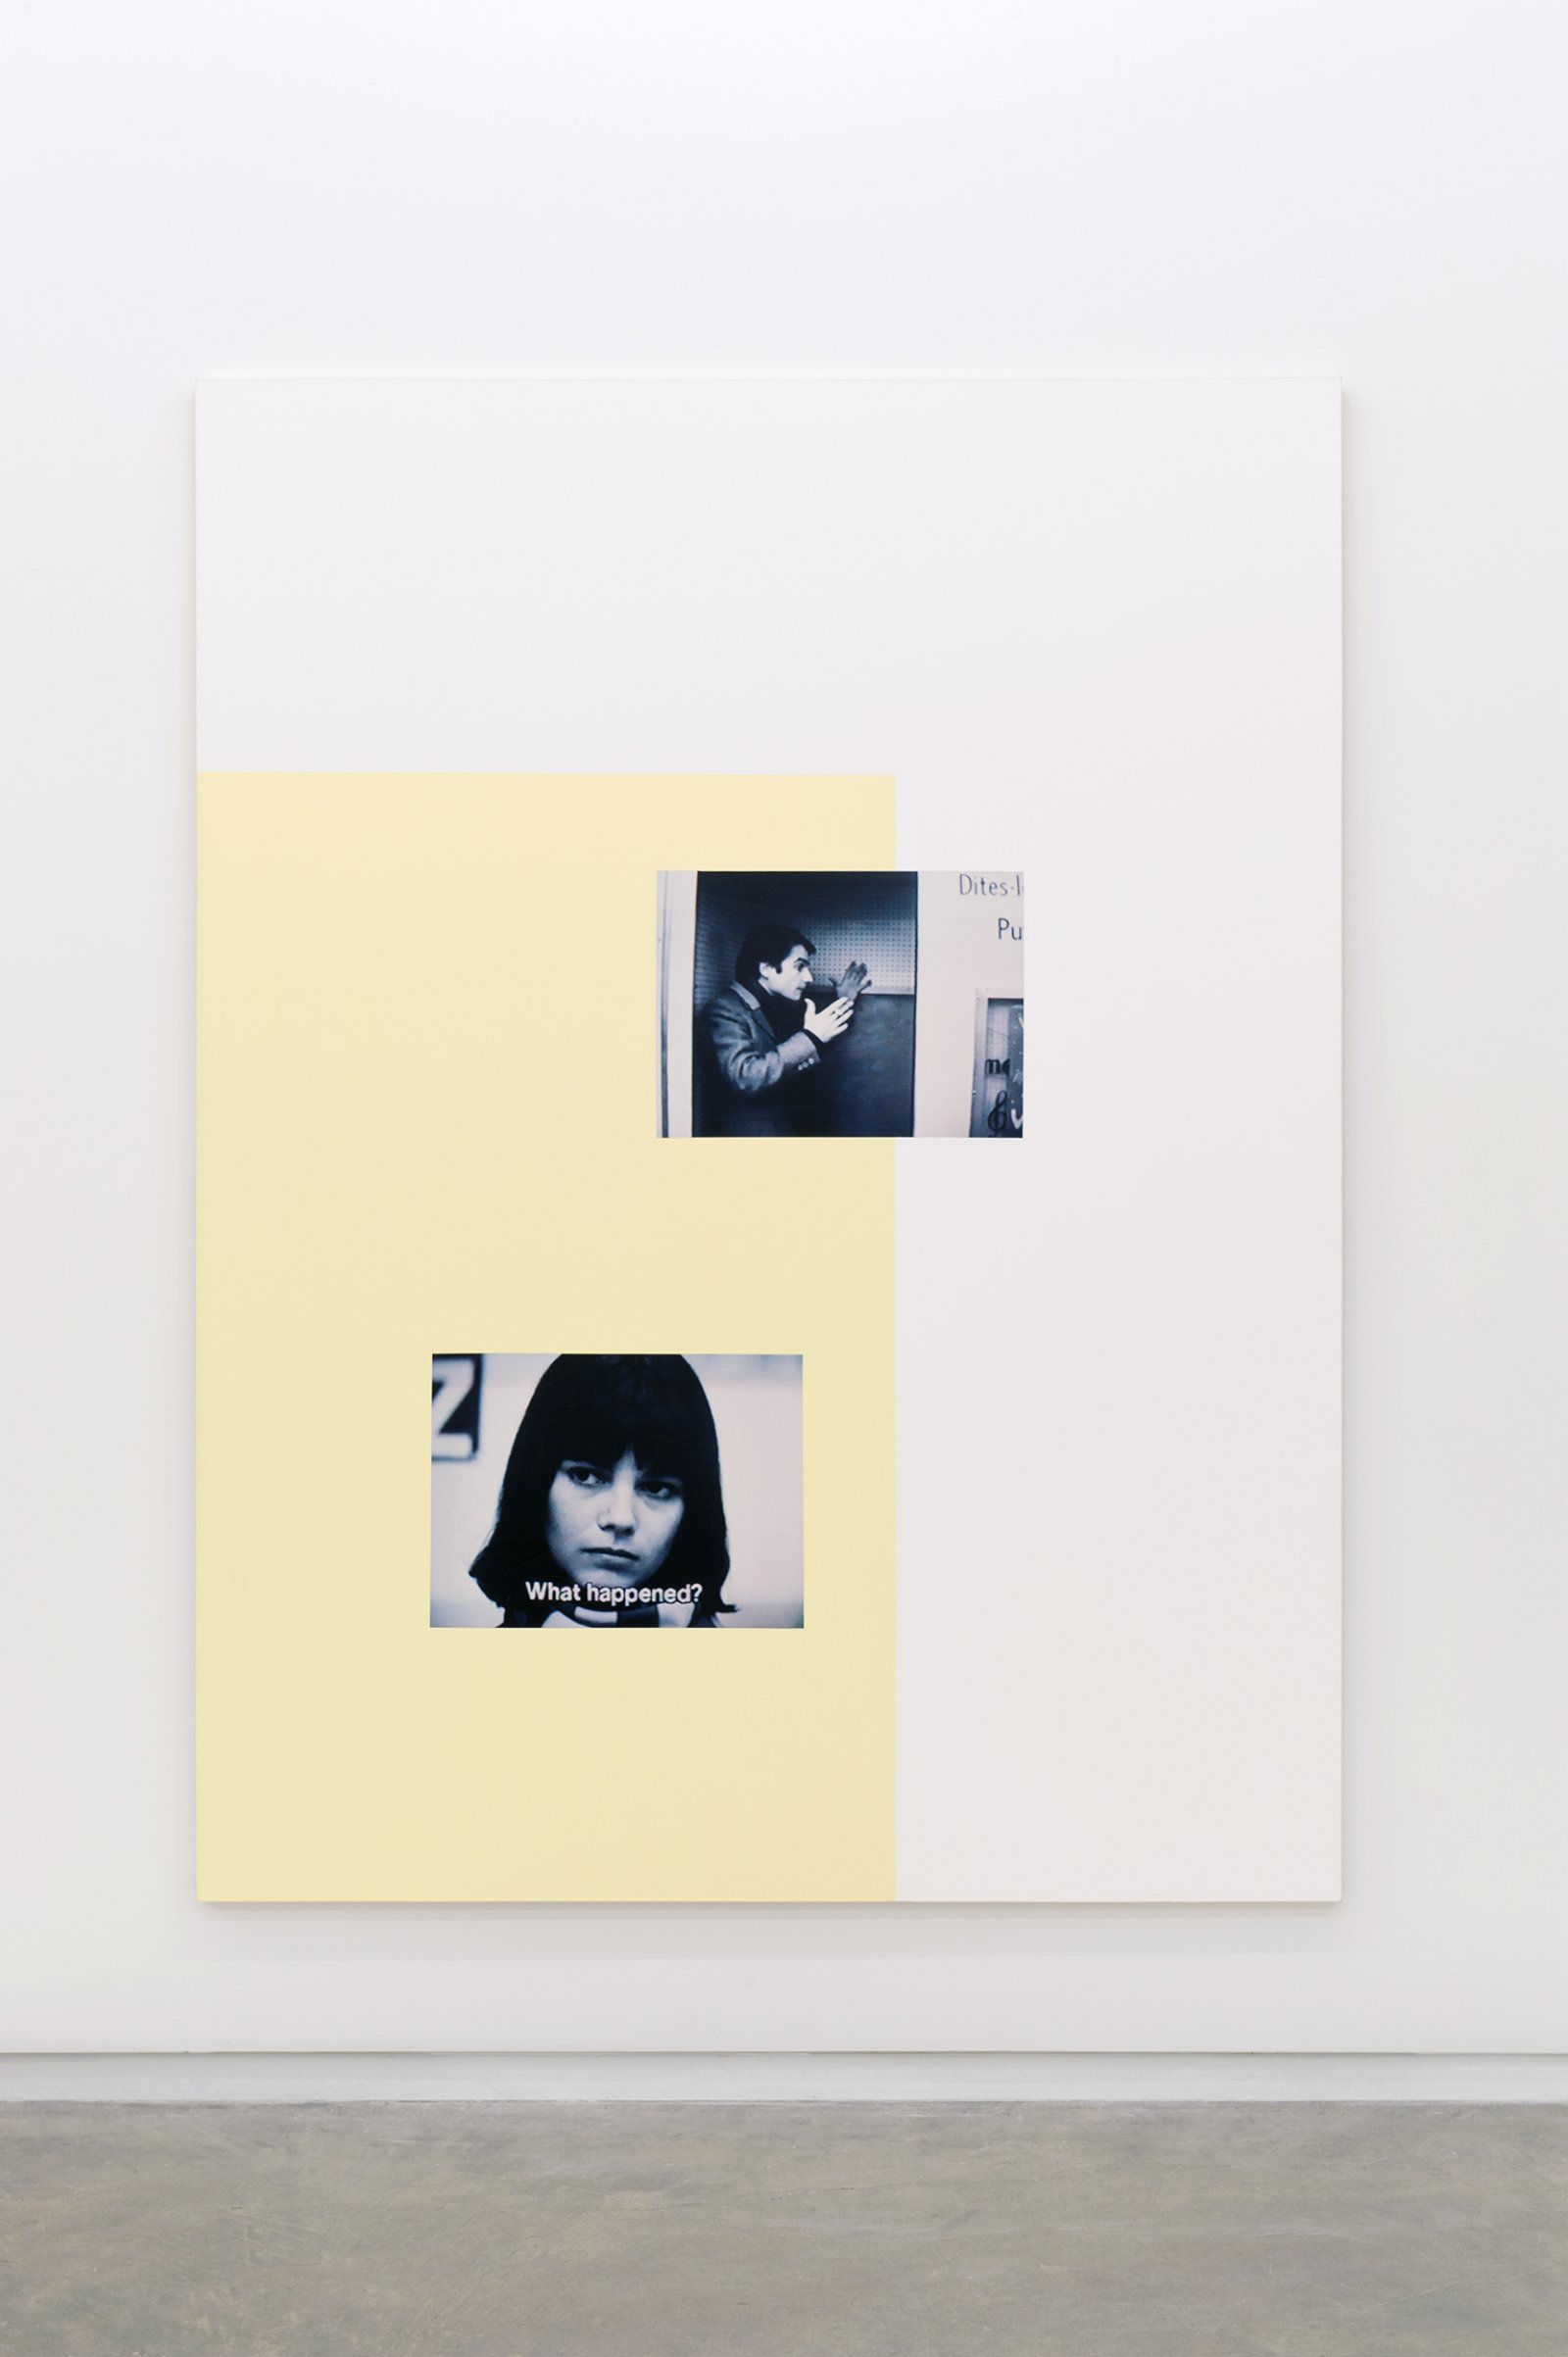 Ian Wallace, Masculin/Feminin II, 1997, photolaminate and acrylic on canvas, 96 x 72 in. (244 x 183 cm) by Ian Wallace